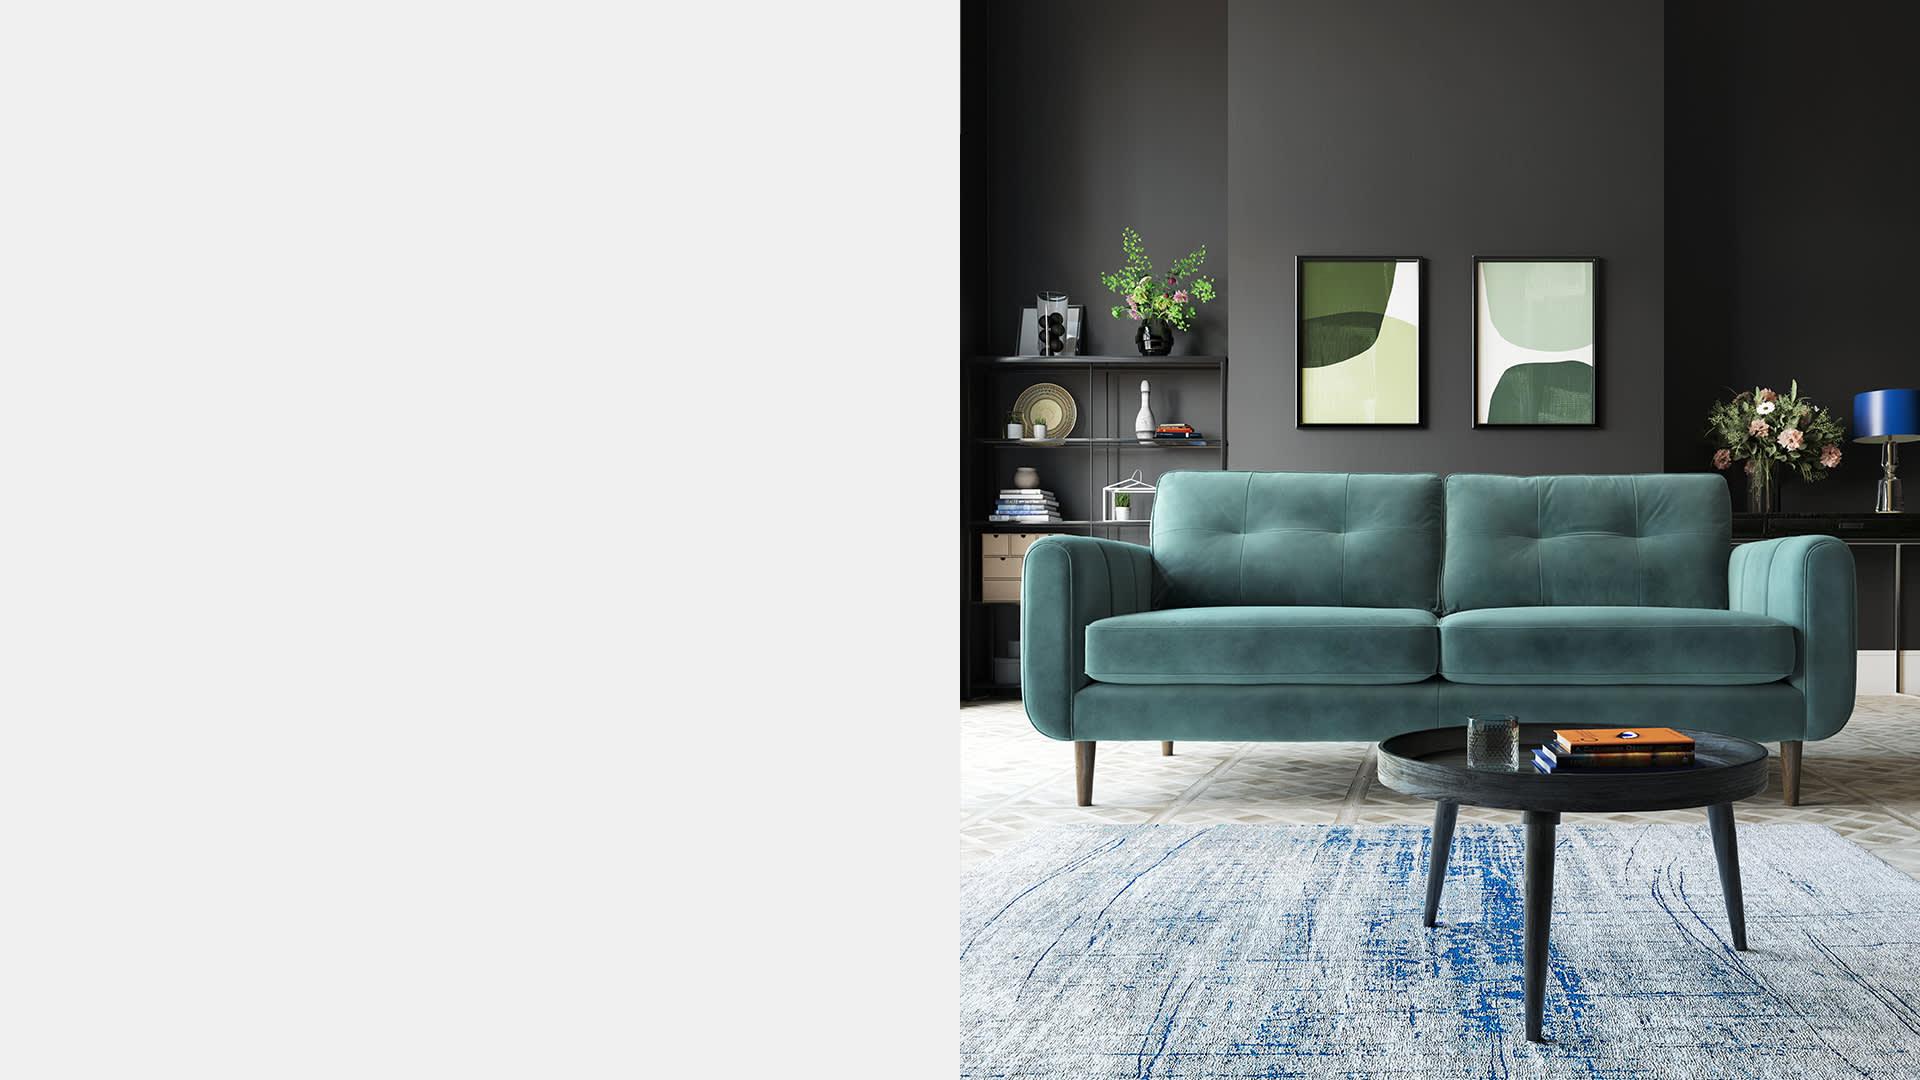 Sofology Pet Friendly Teal Fabric Sofa